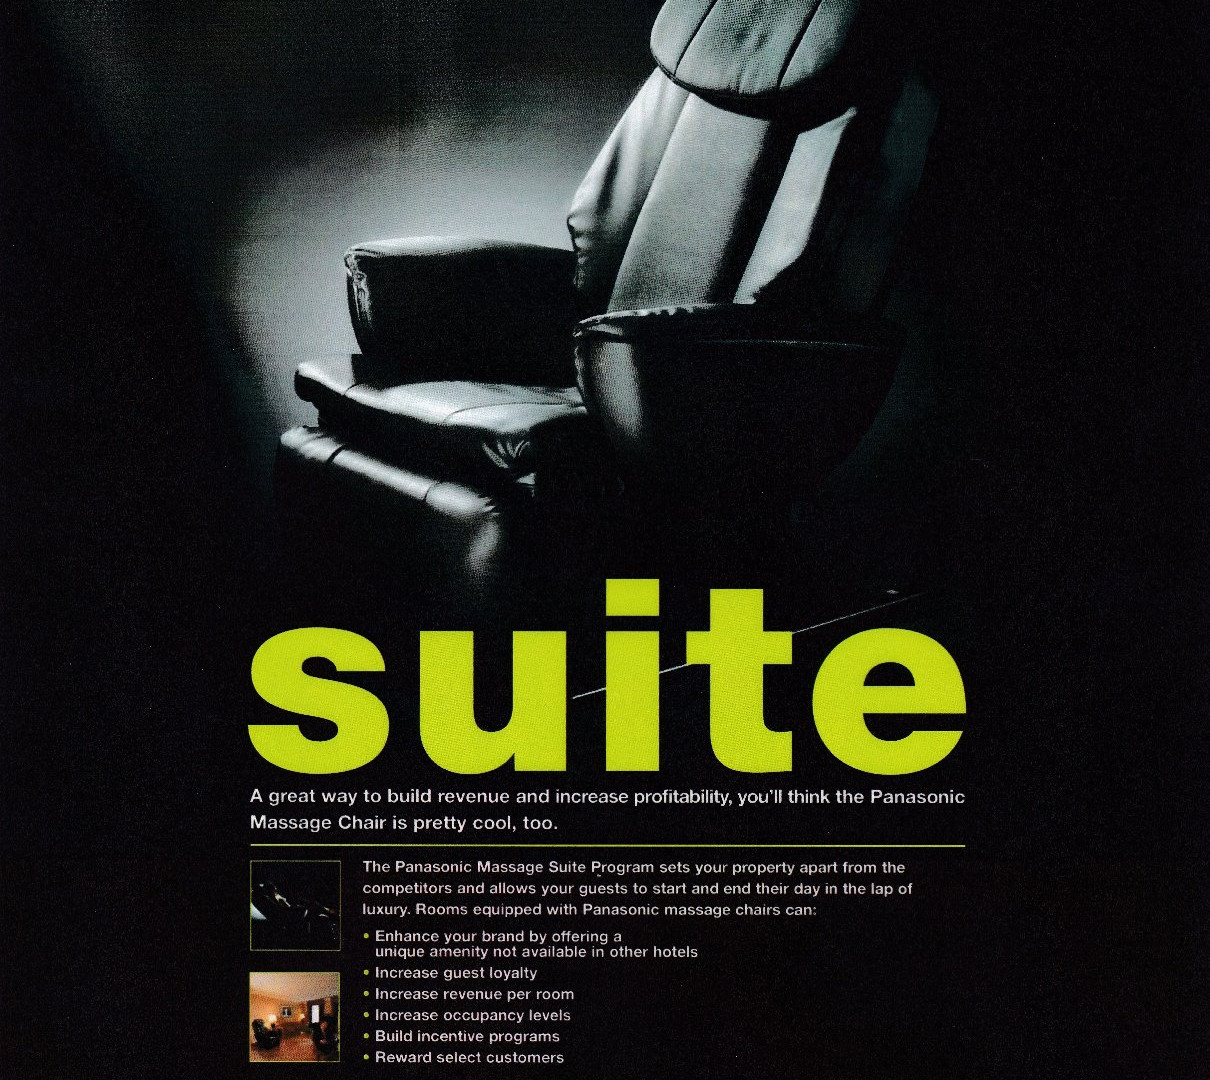 Panasonic Massage Chair Hotel promo